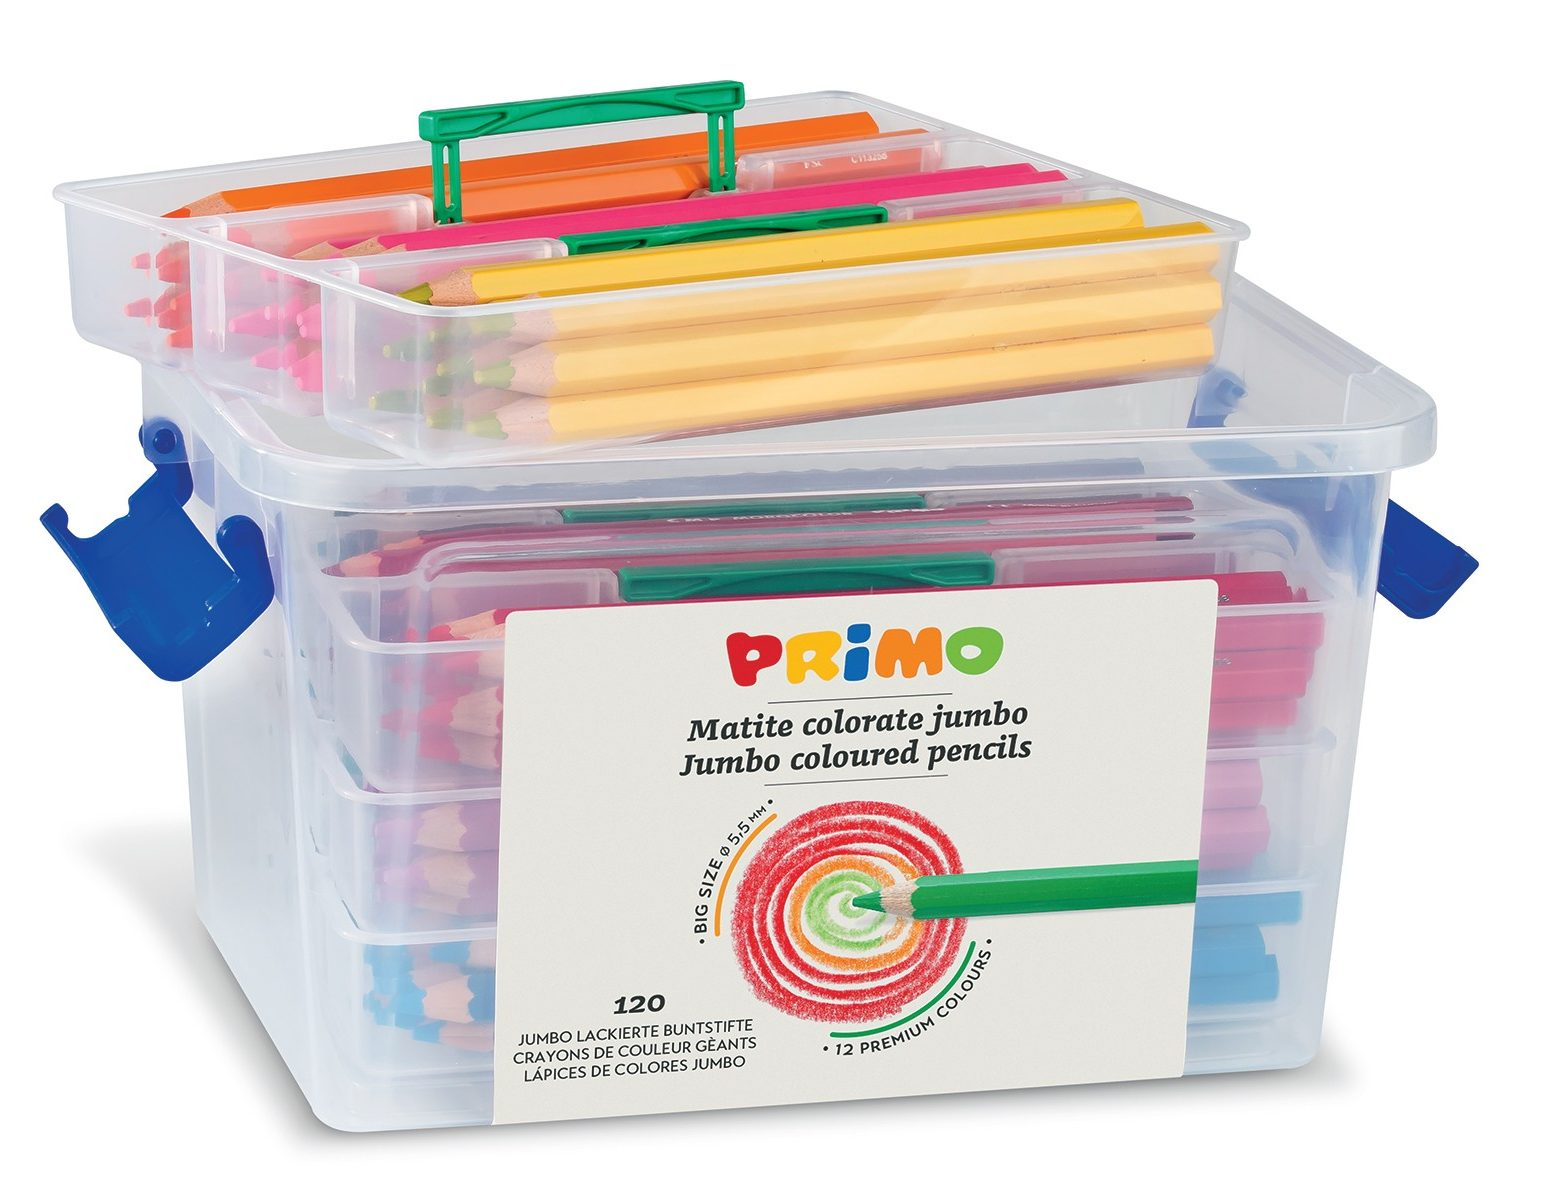 Pastelky PRIMO JUMBO, 120ks, tuha 5,5mm, PP box